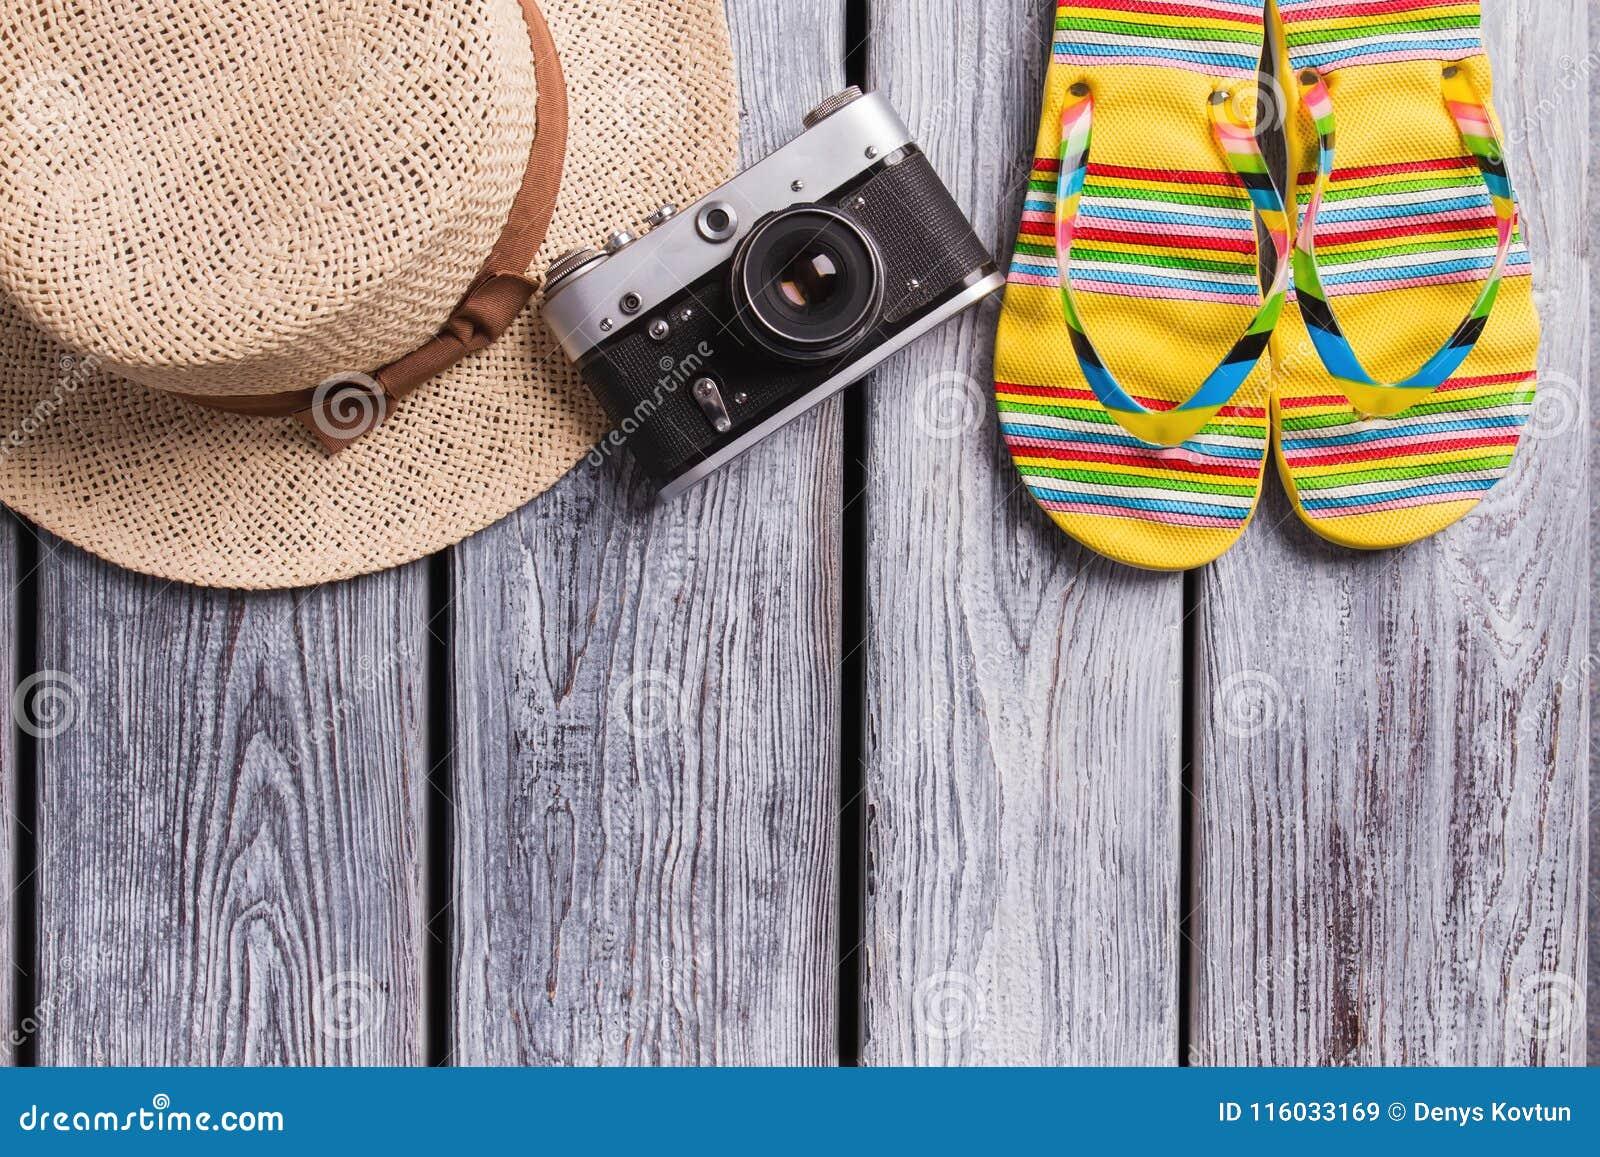 Straw hat, vintage photo camera and flip-flops.